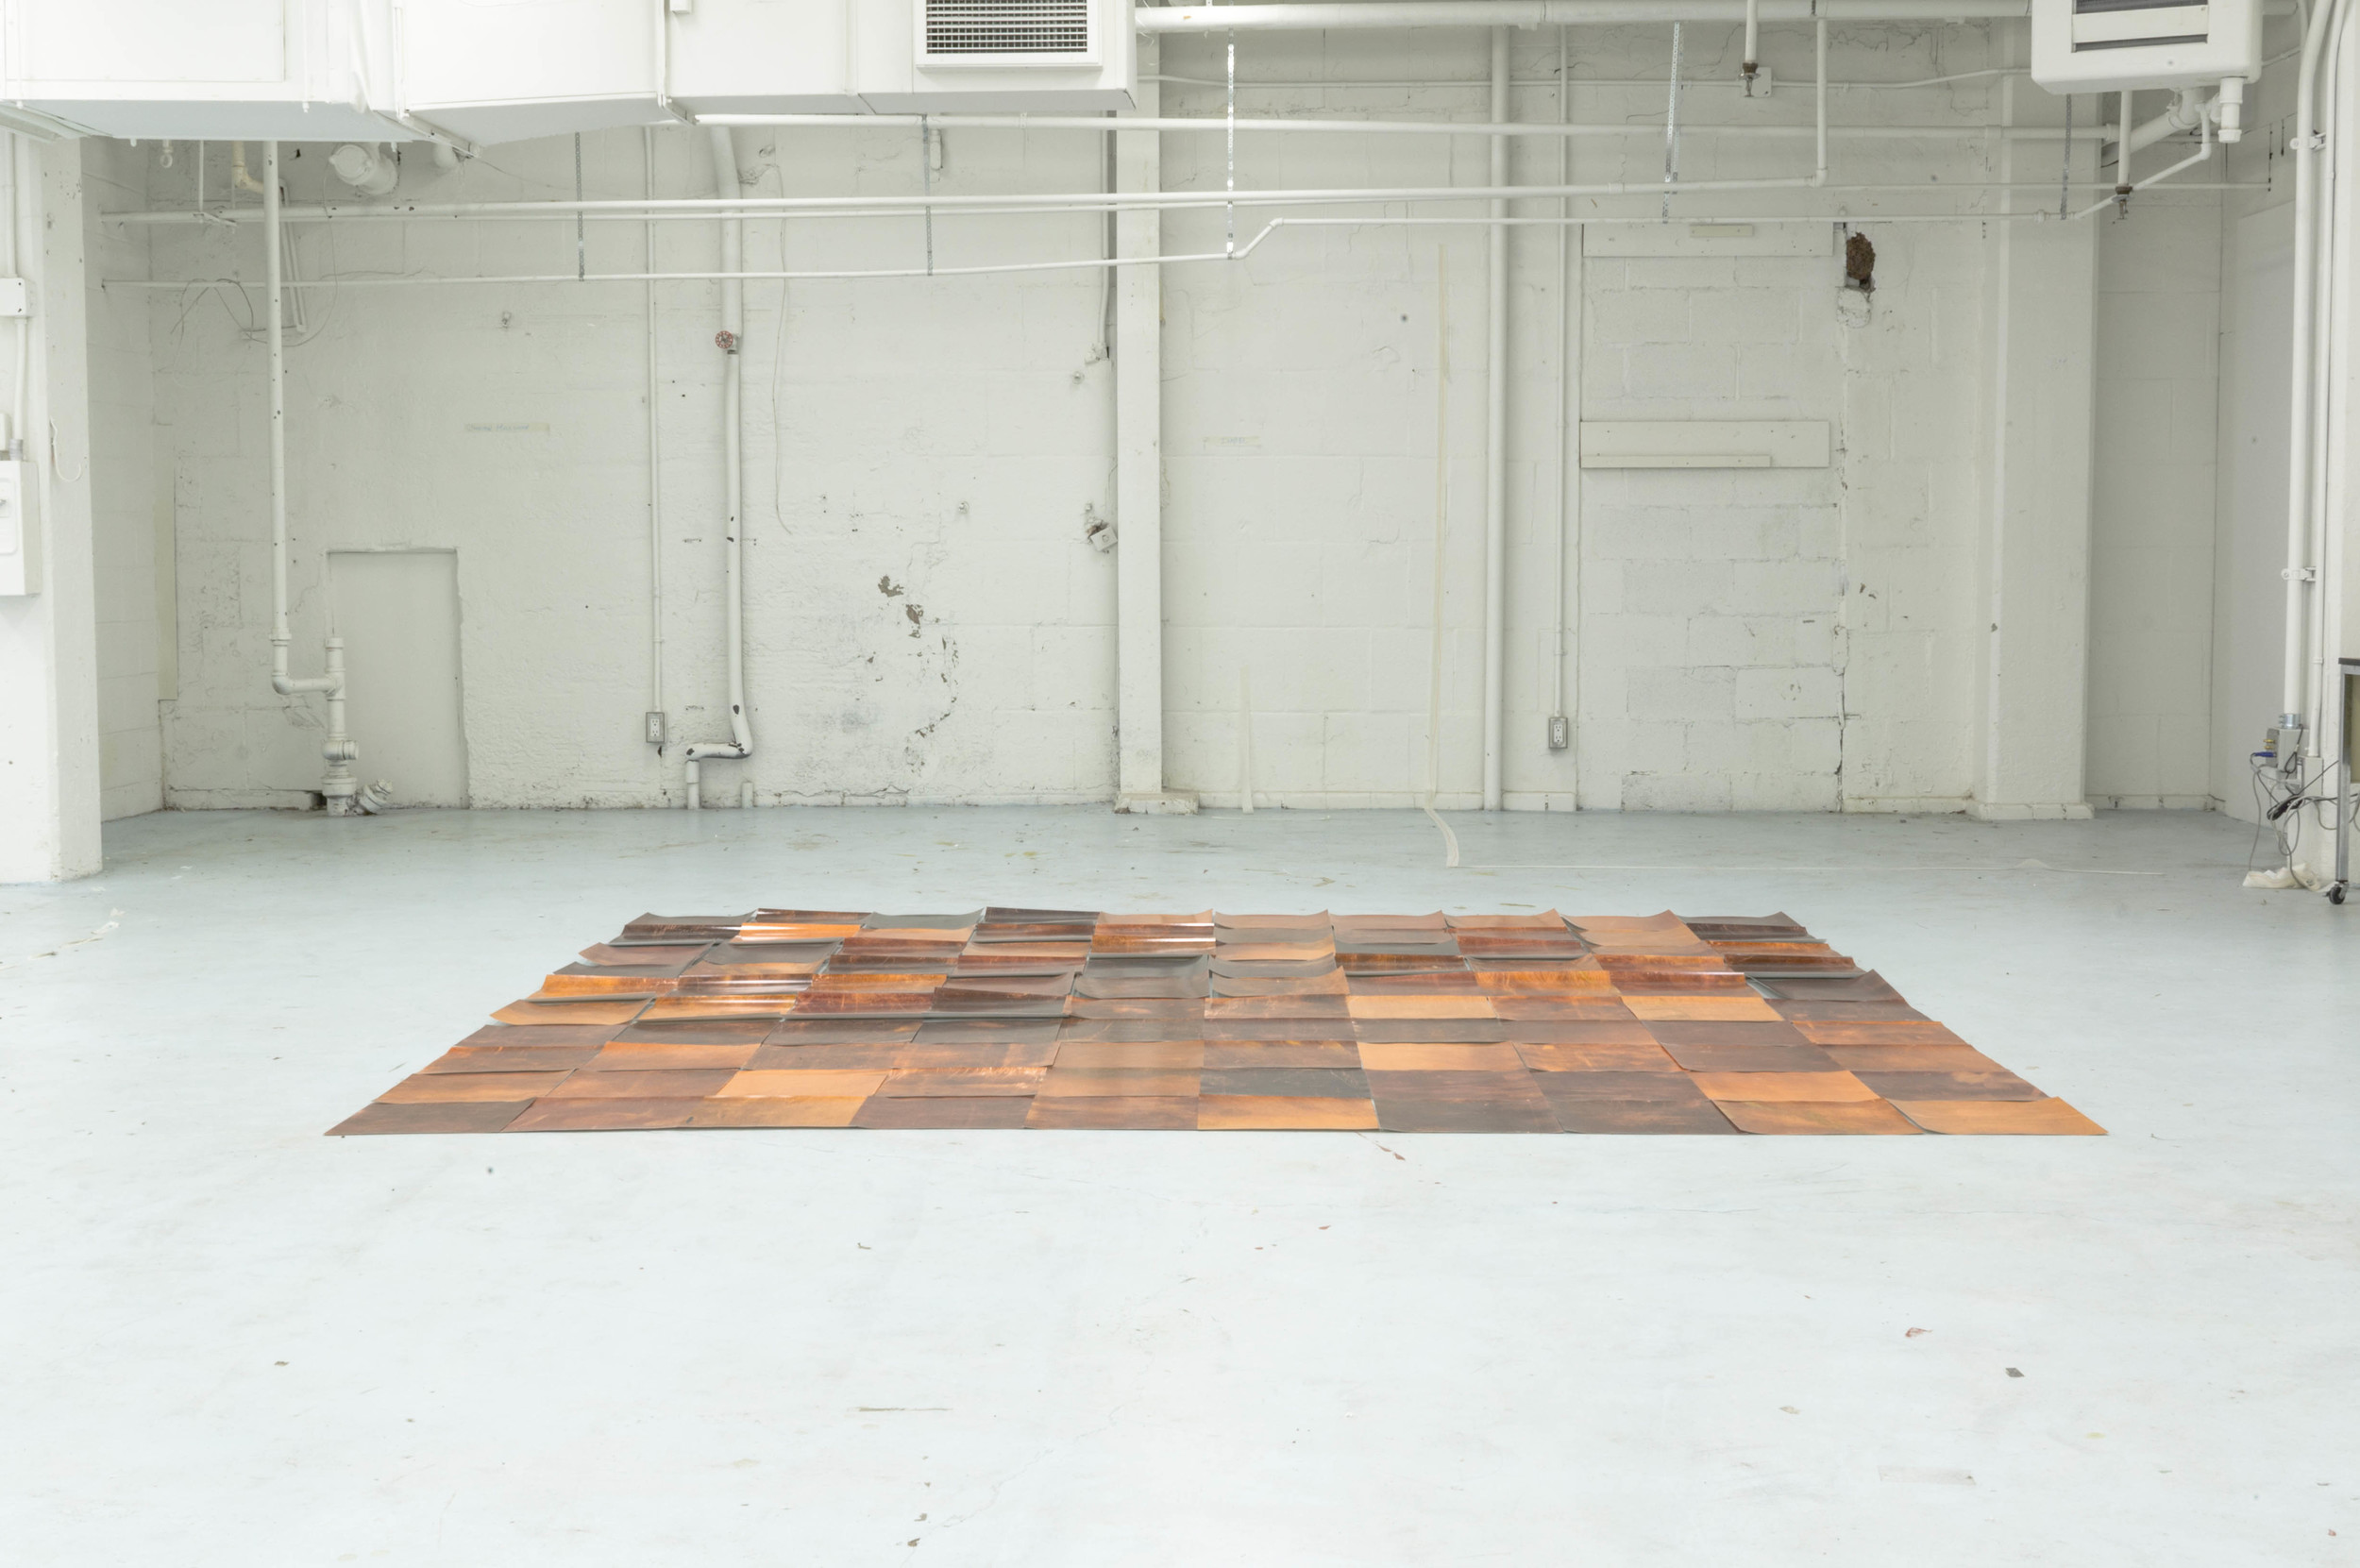 "10x10 Copper Altstadt (After Carl Andre) 2014 120x120x0.08"" C-Prints"